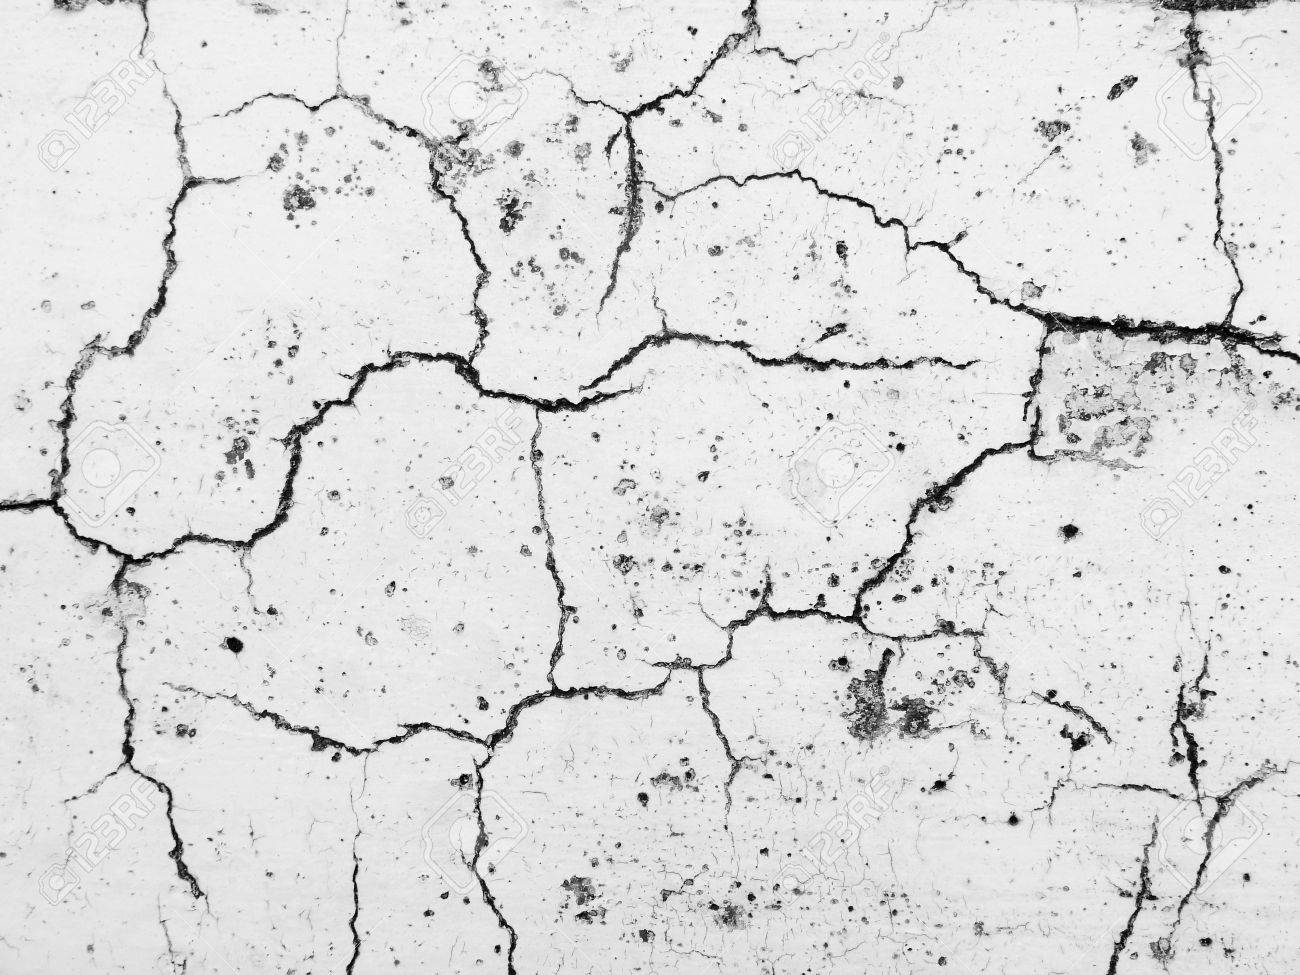 grunge sketch effect texture the cracks texture cracked concrete